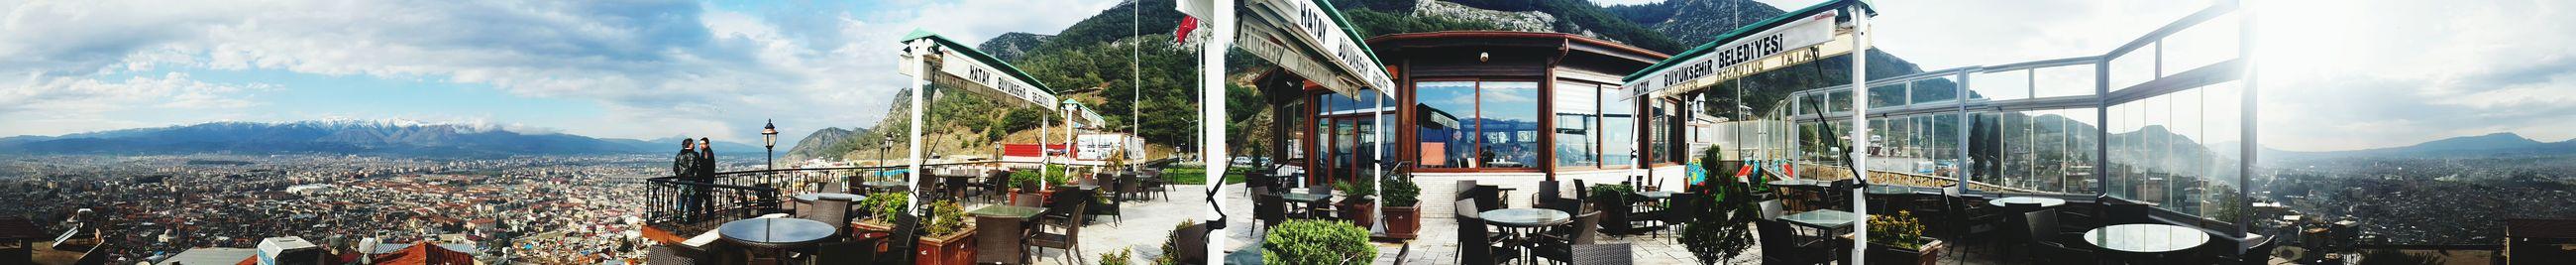 Panoramic Photography Antakya Hatay  Camera Note3 Manzara Travel Restaurant Kafe Relaxing